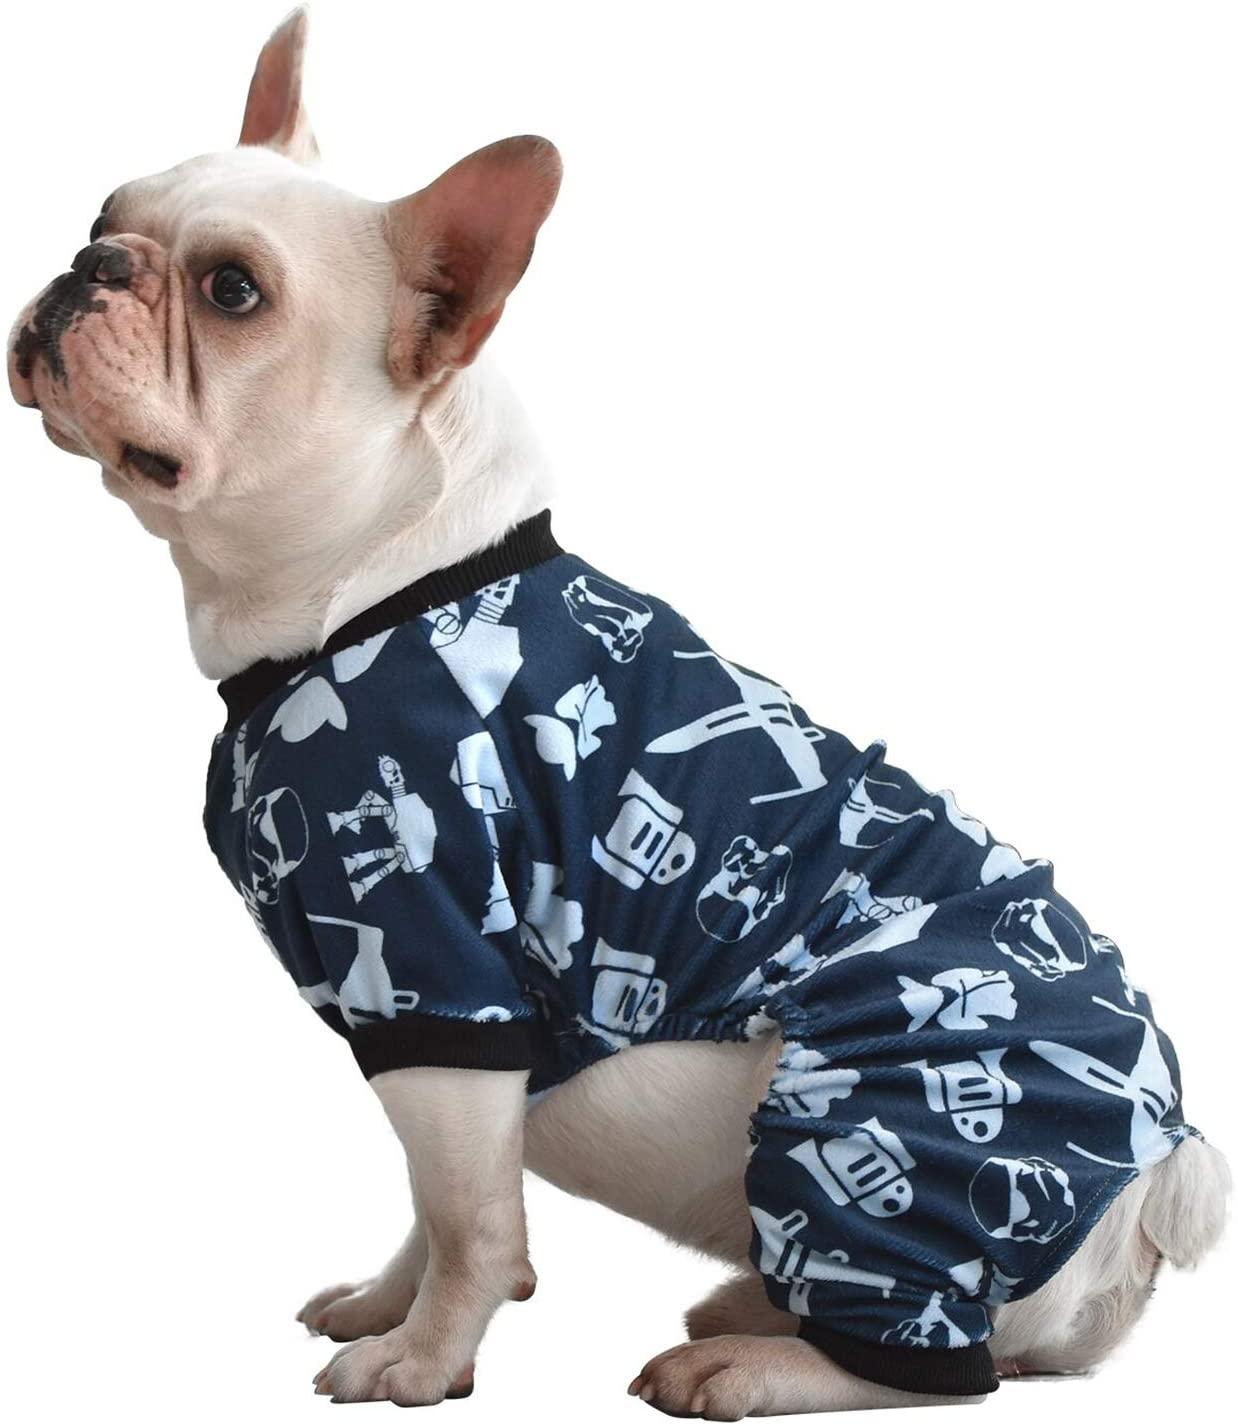 CuteBone-Dog-Pajamas. Cutest 10 Pajamas for Dogs on Amazon in 2021/2022